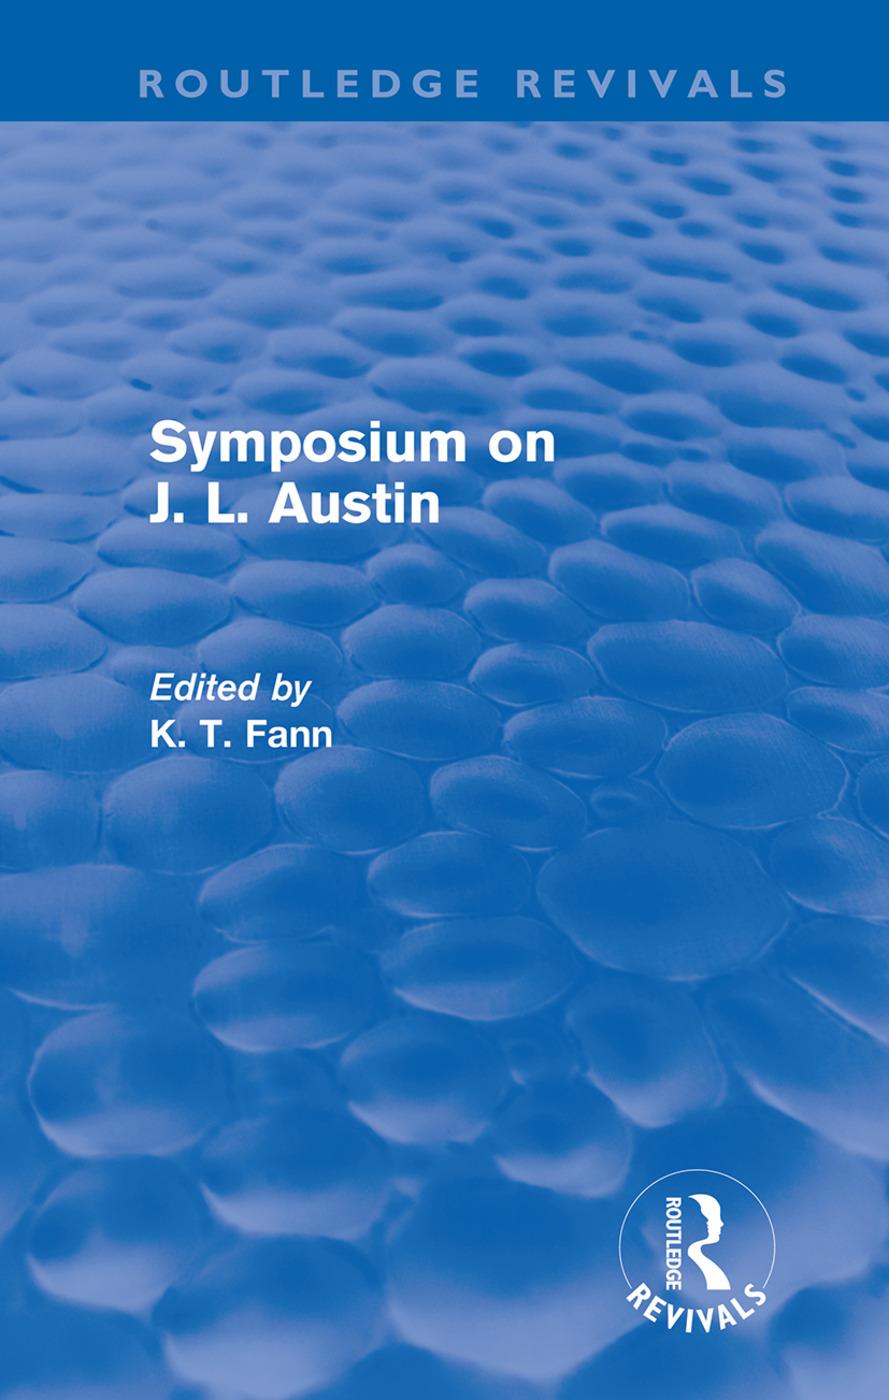 Symposium on J. L. Austin (Routledge Revivals) (Hardback) book cover